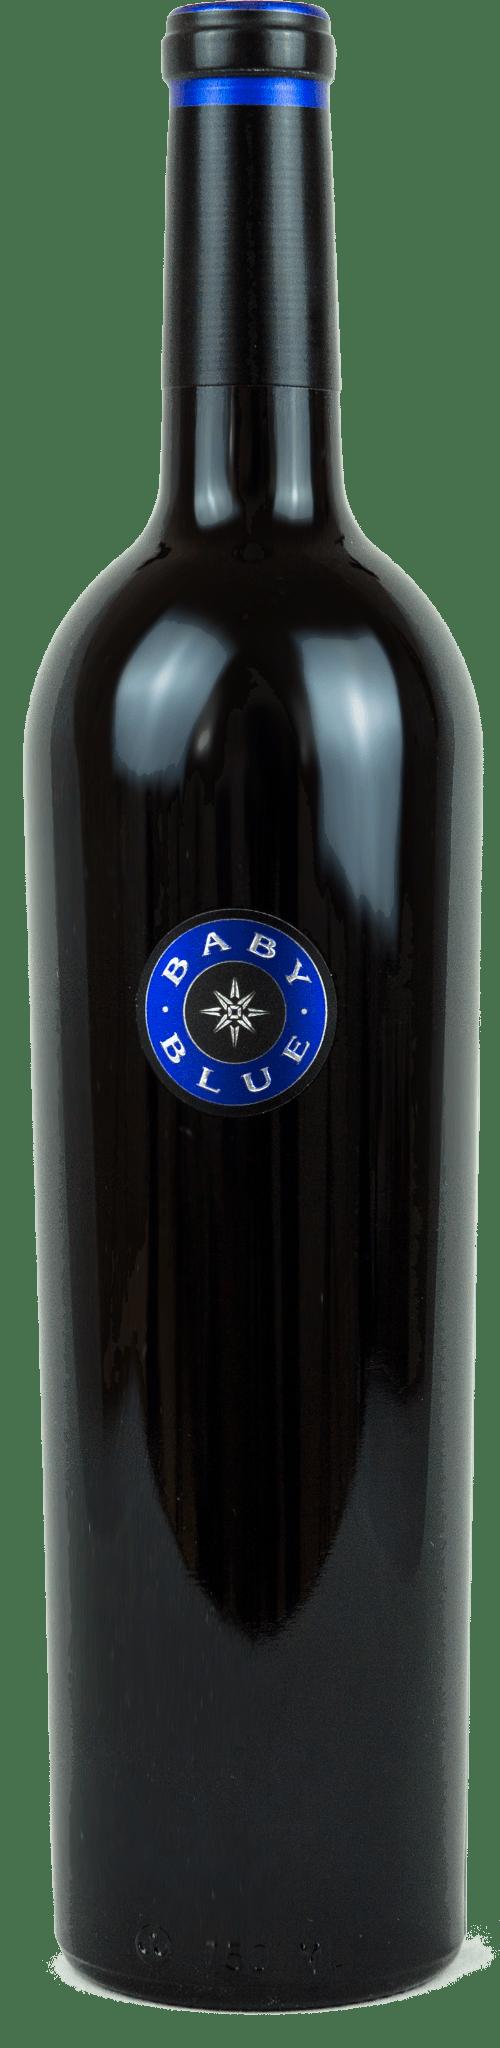 blue-rock-vineyard-baby-blue-red-1-1-1